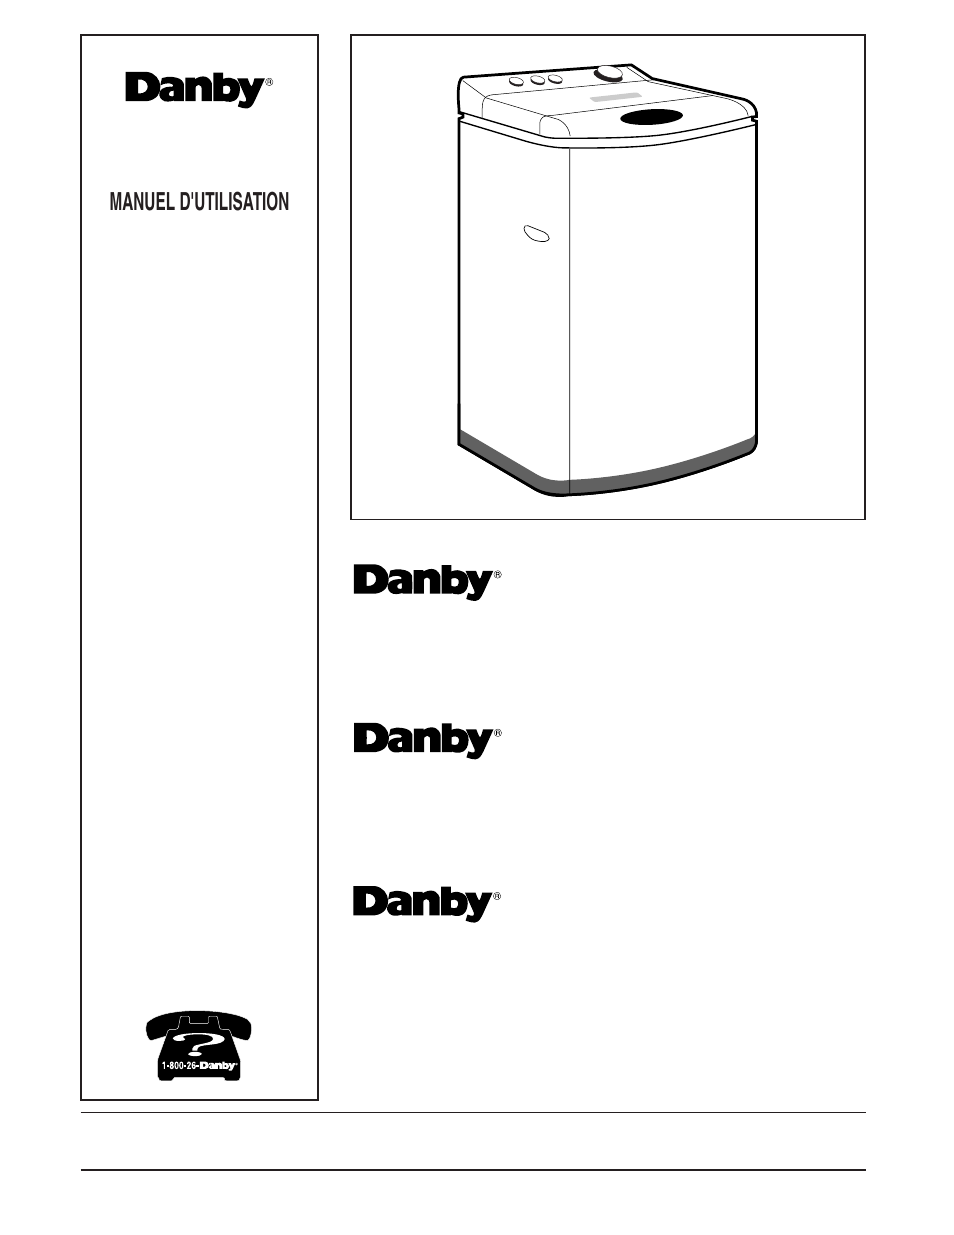 Ddw1801mw | danby 8 place setting dishwasher | en-us.